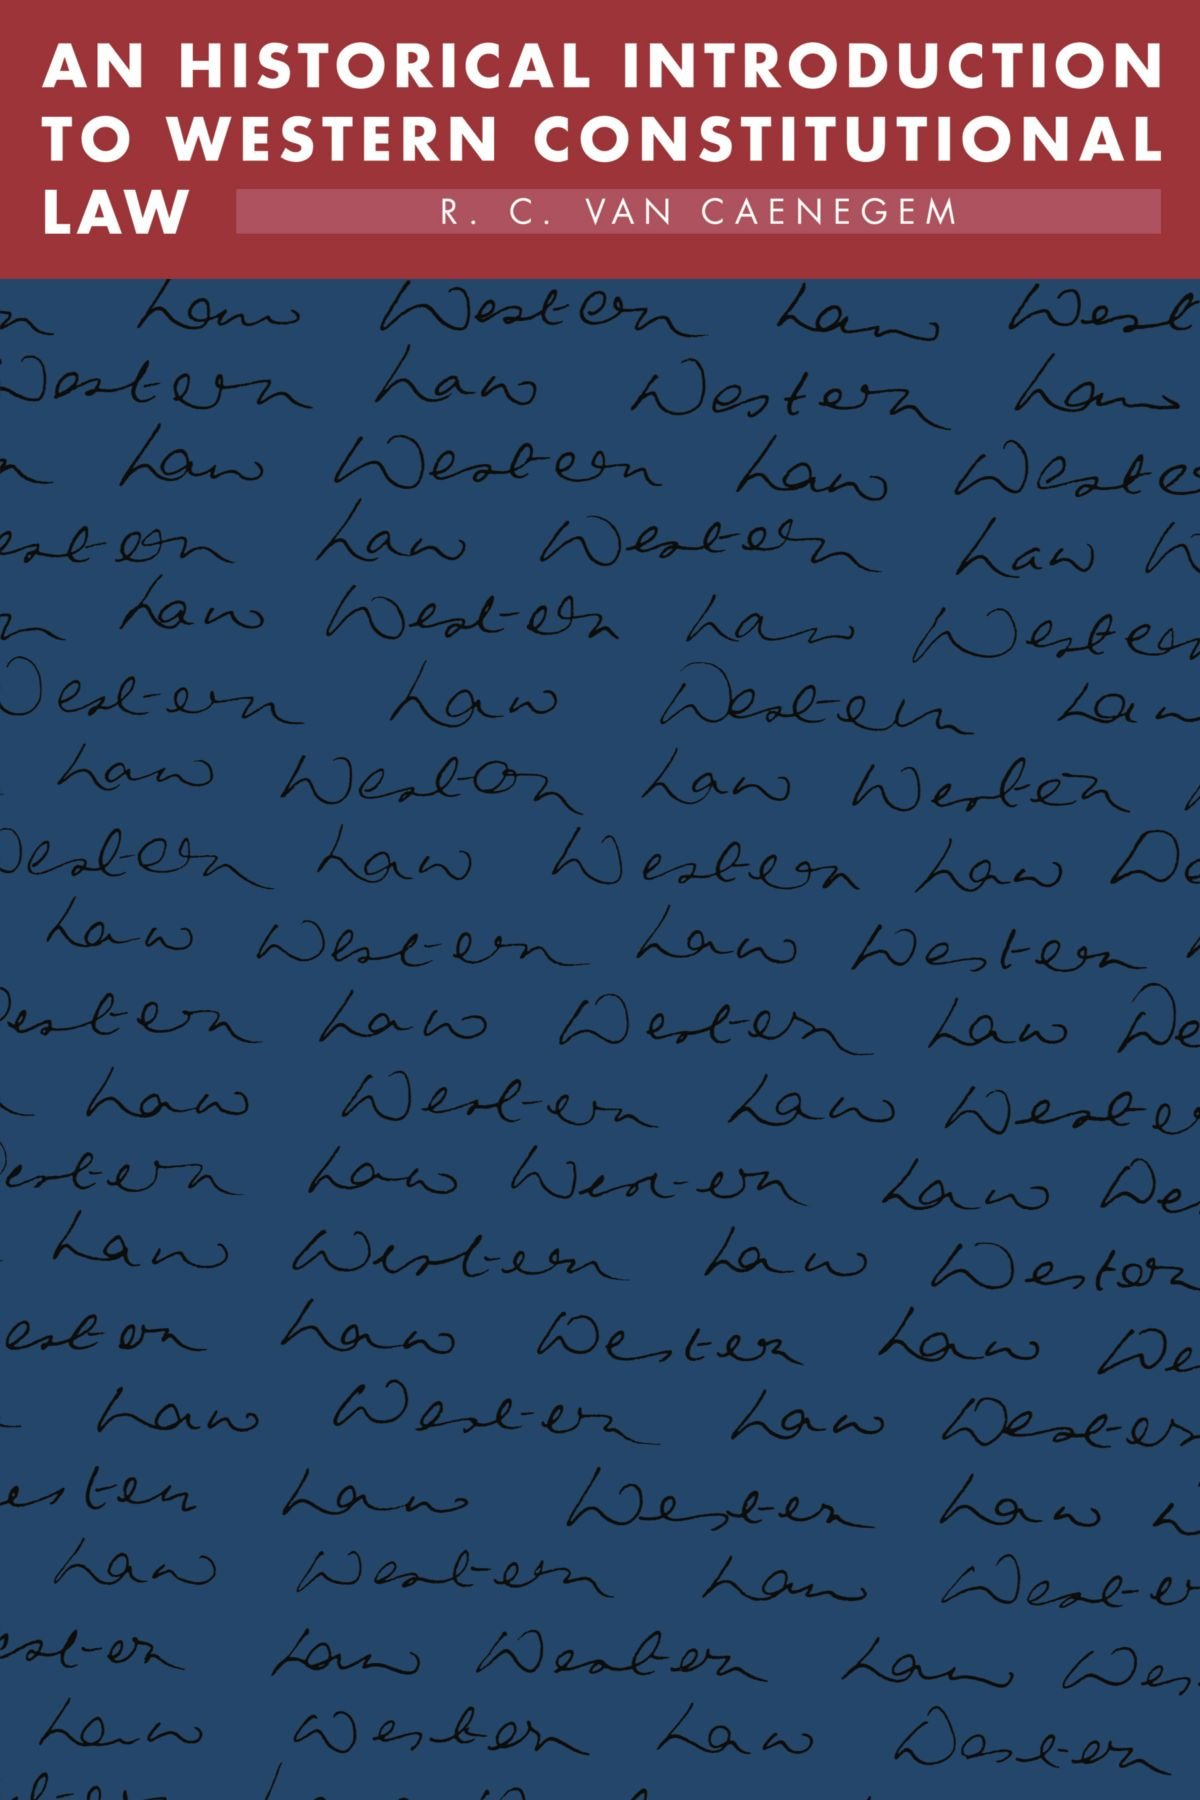 An Historical Introduction to Western Constitutional Law (Inglese) Copertina flessibile – 15 set 2010 R. C. van van Caenegem Cambridge University Press 0521476933 Europe